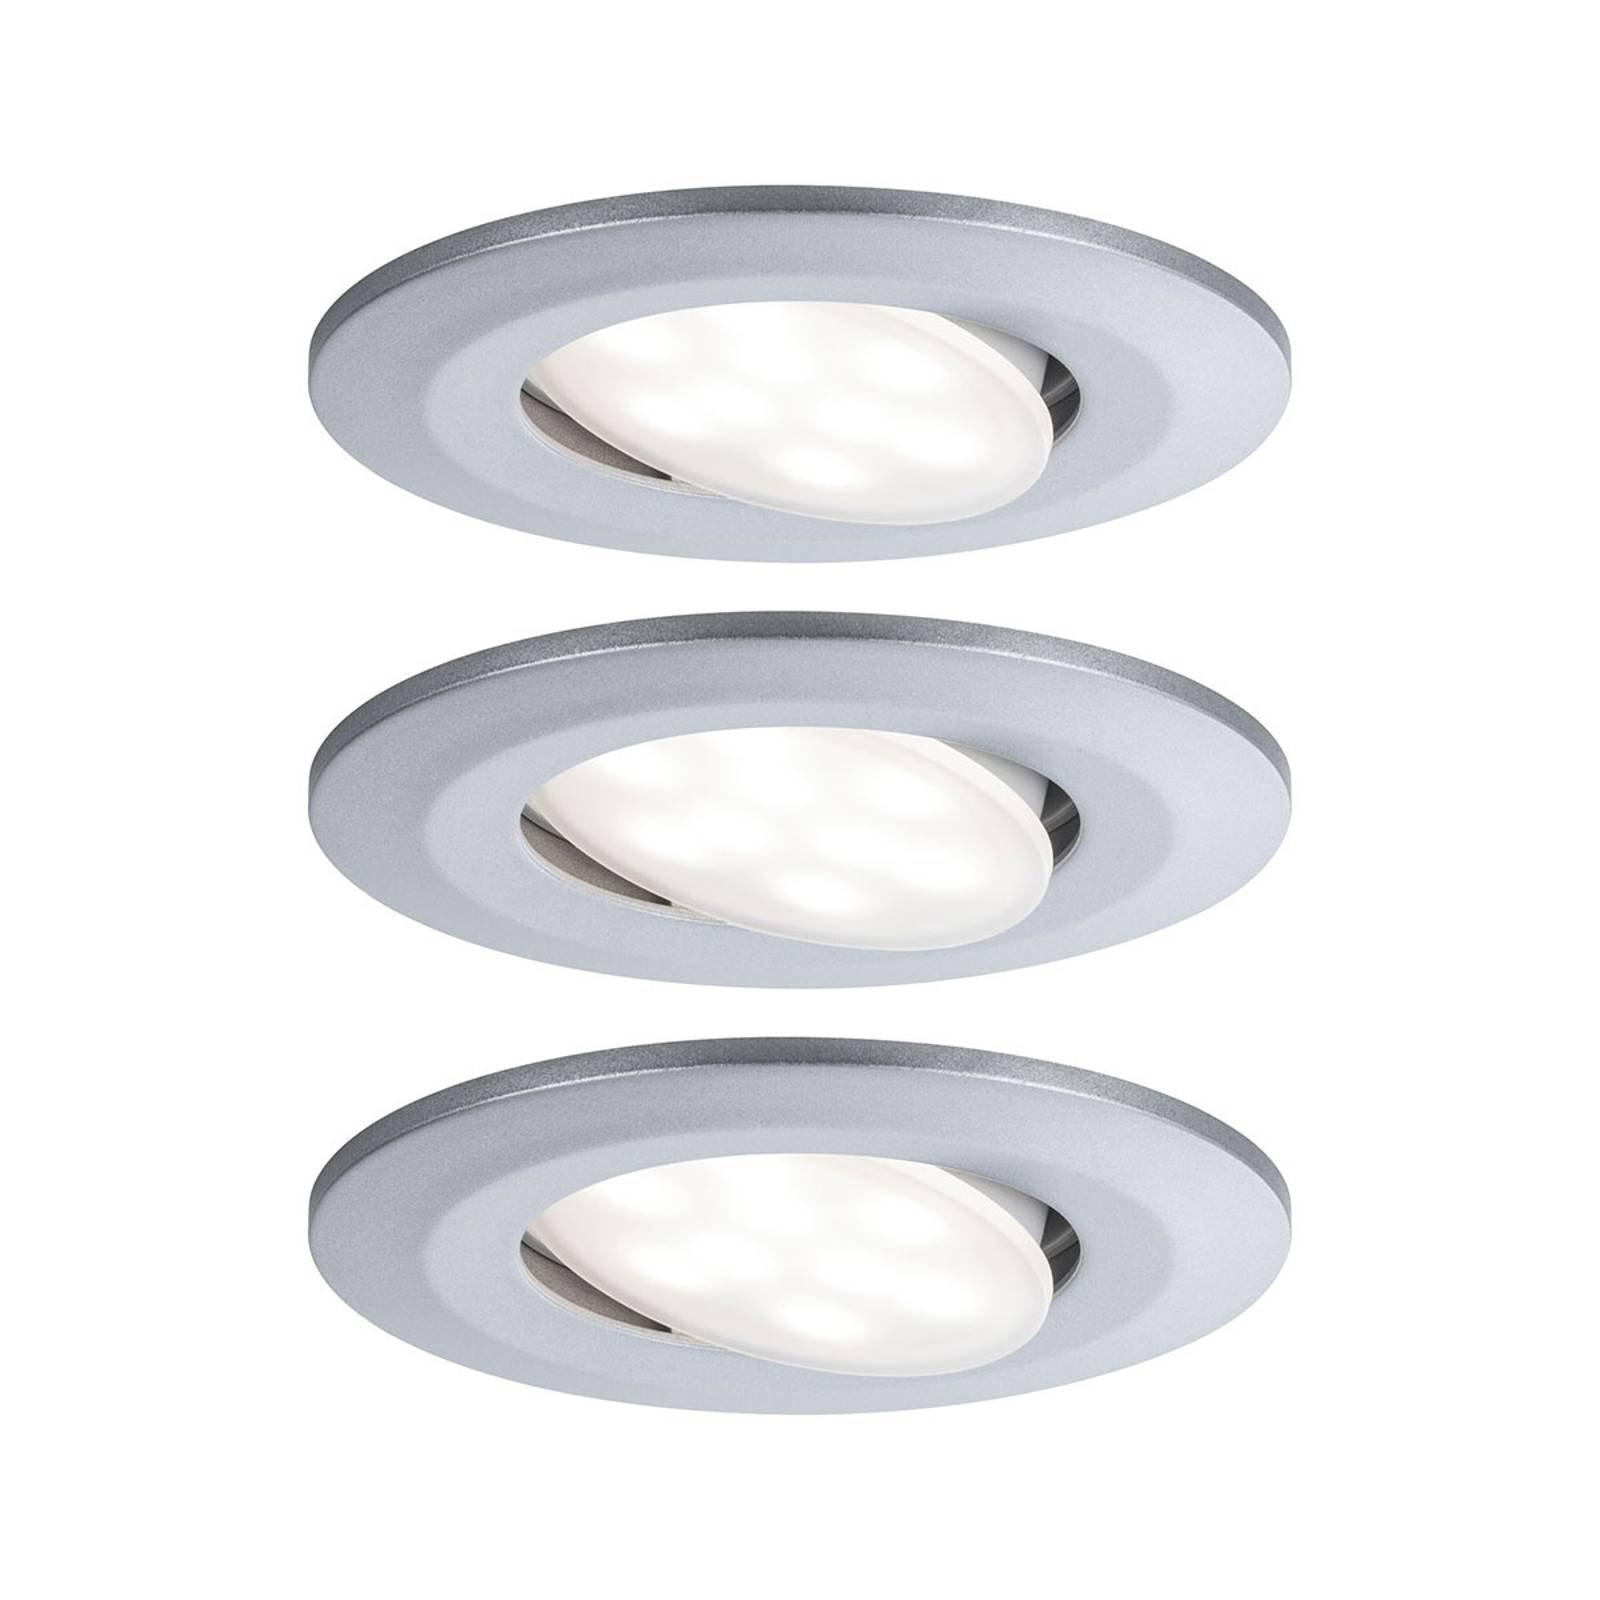 Paulmann Calla LED-downlight dimbar krom 3-pkn.